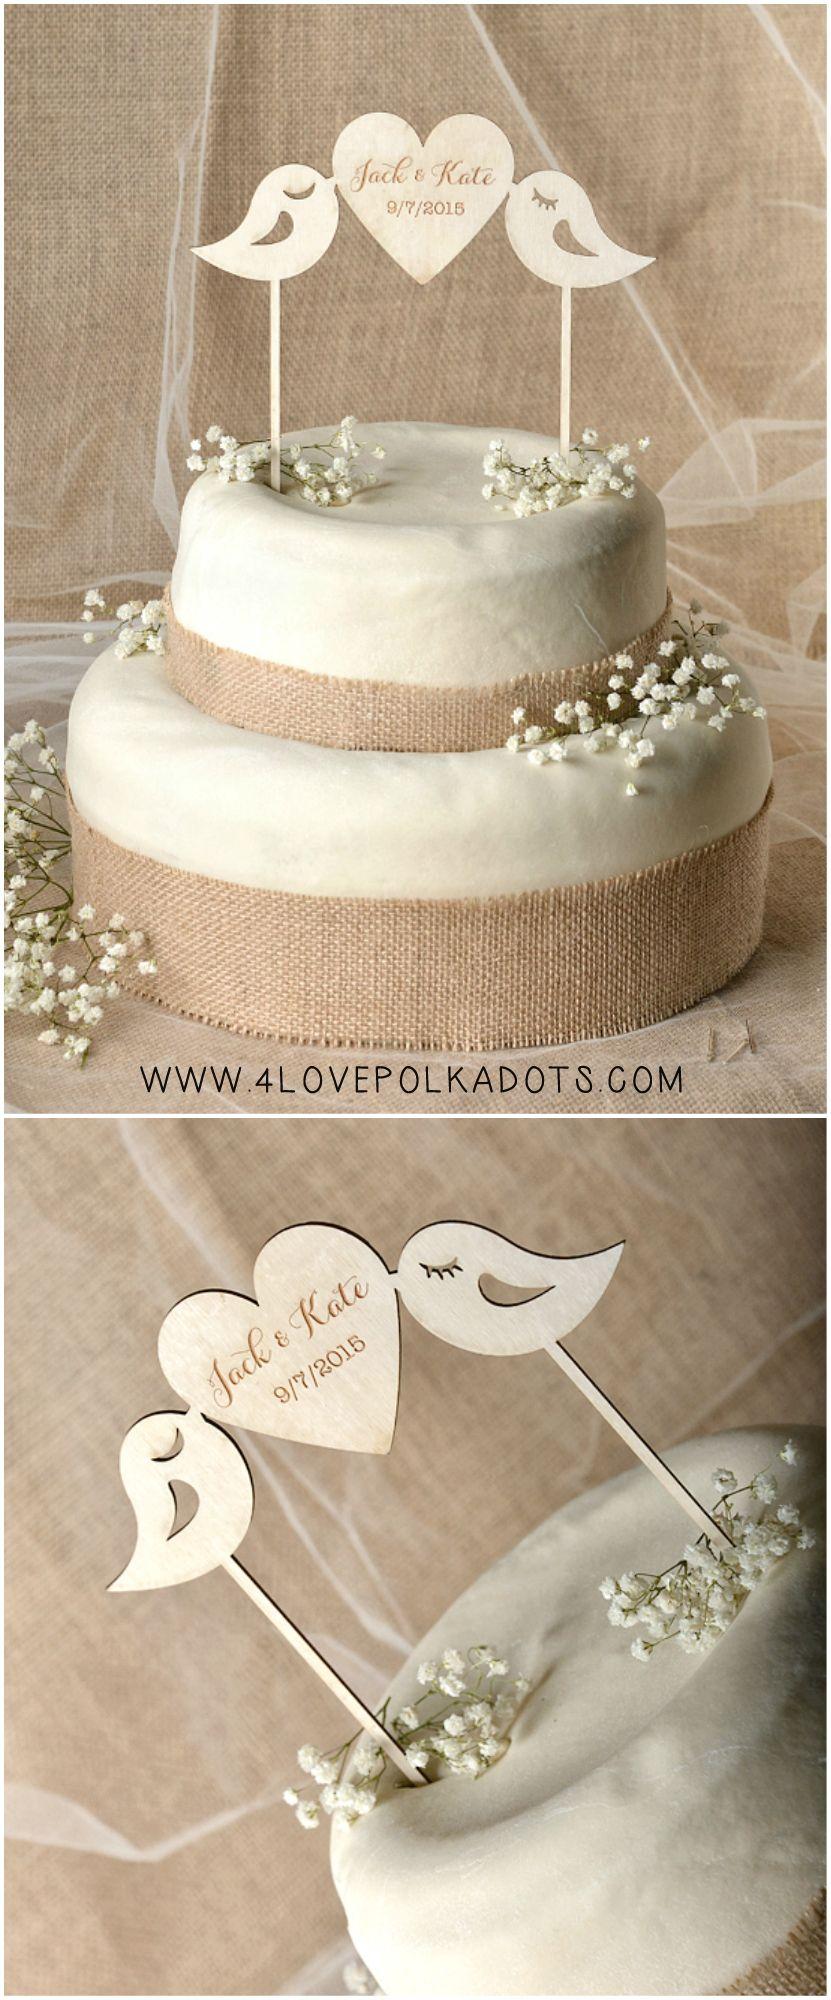 Wooden Wedding Cake Topper With Birds Weddingideas Caketopper Weddingcake Wood Cake Topper Wedding Romantic Wedding Cake Toppers Bird Cake Topper Wedding